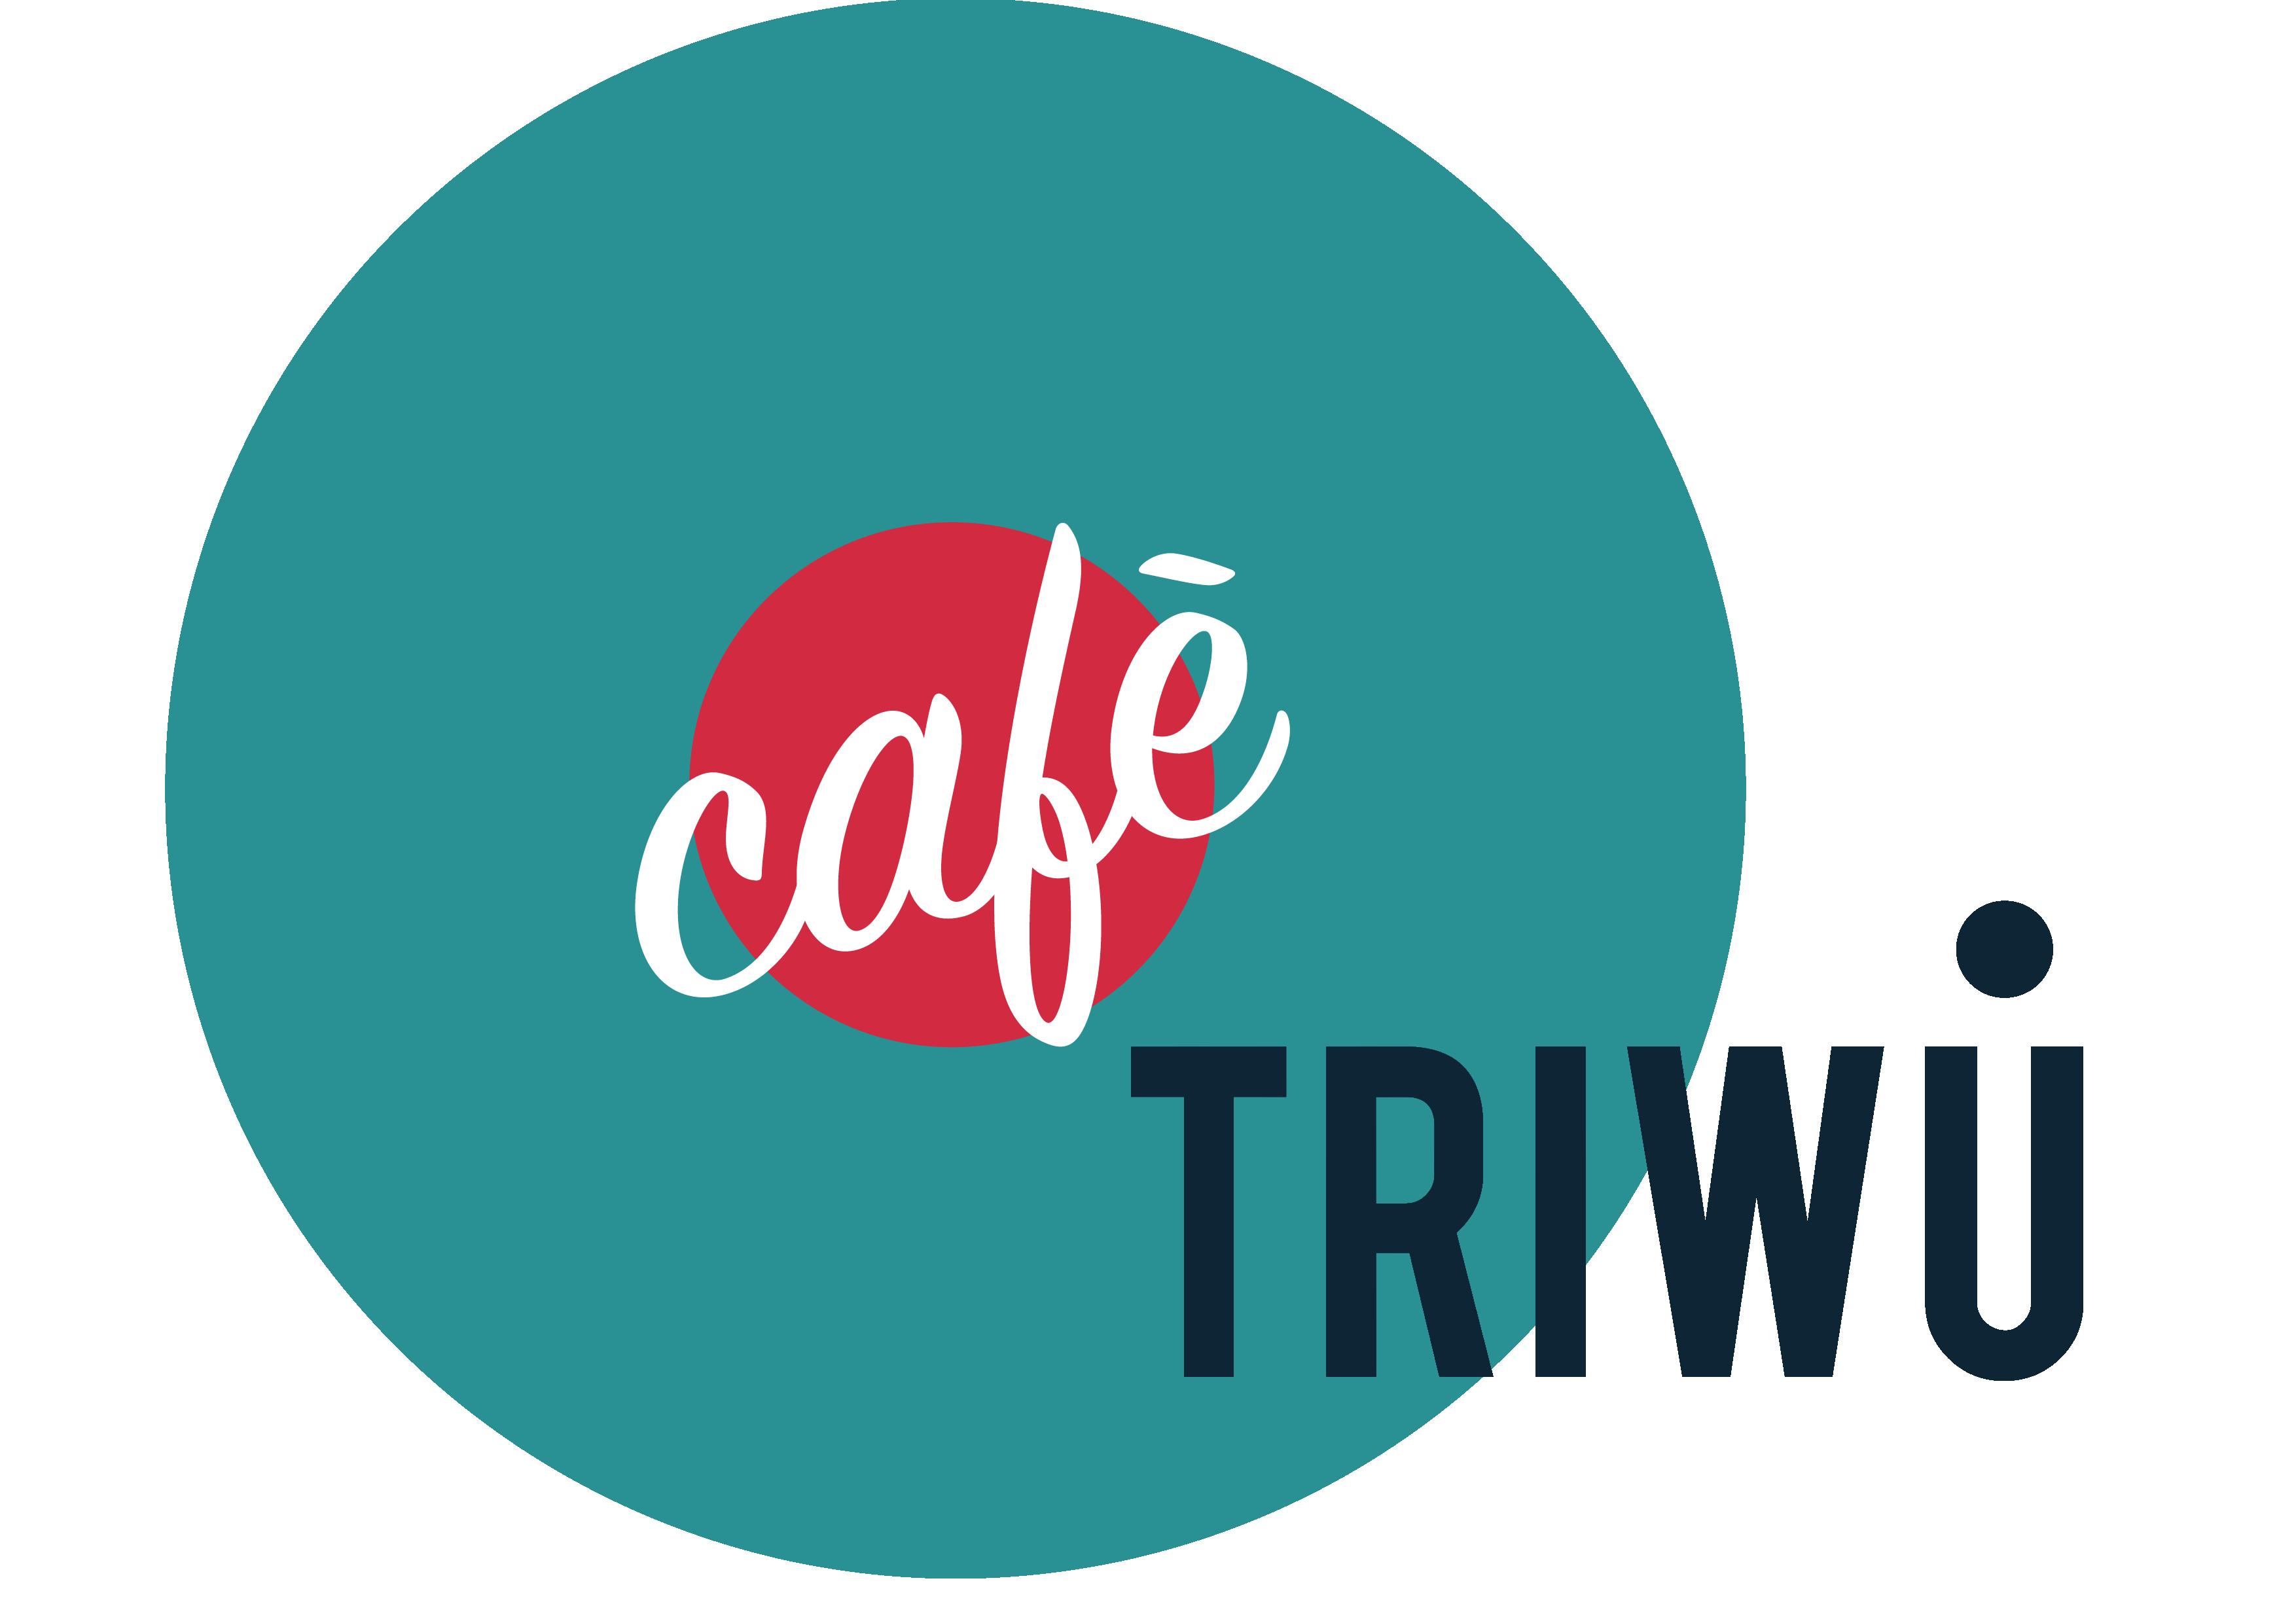 CAFE' TRIWU' LOGO-01